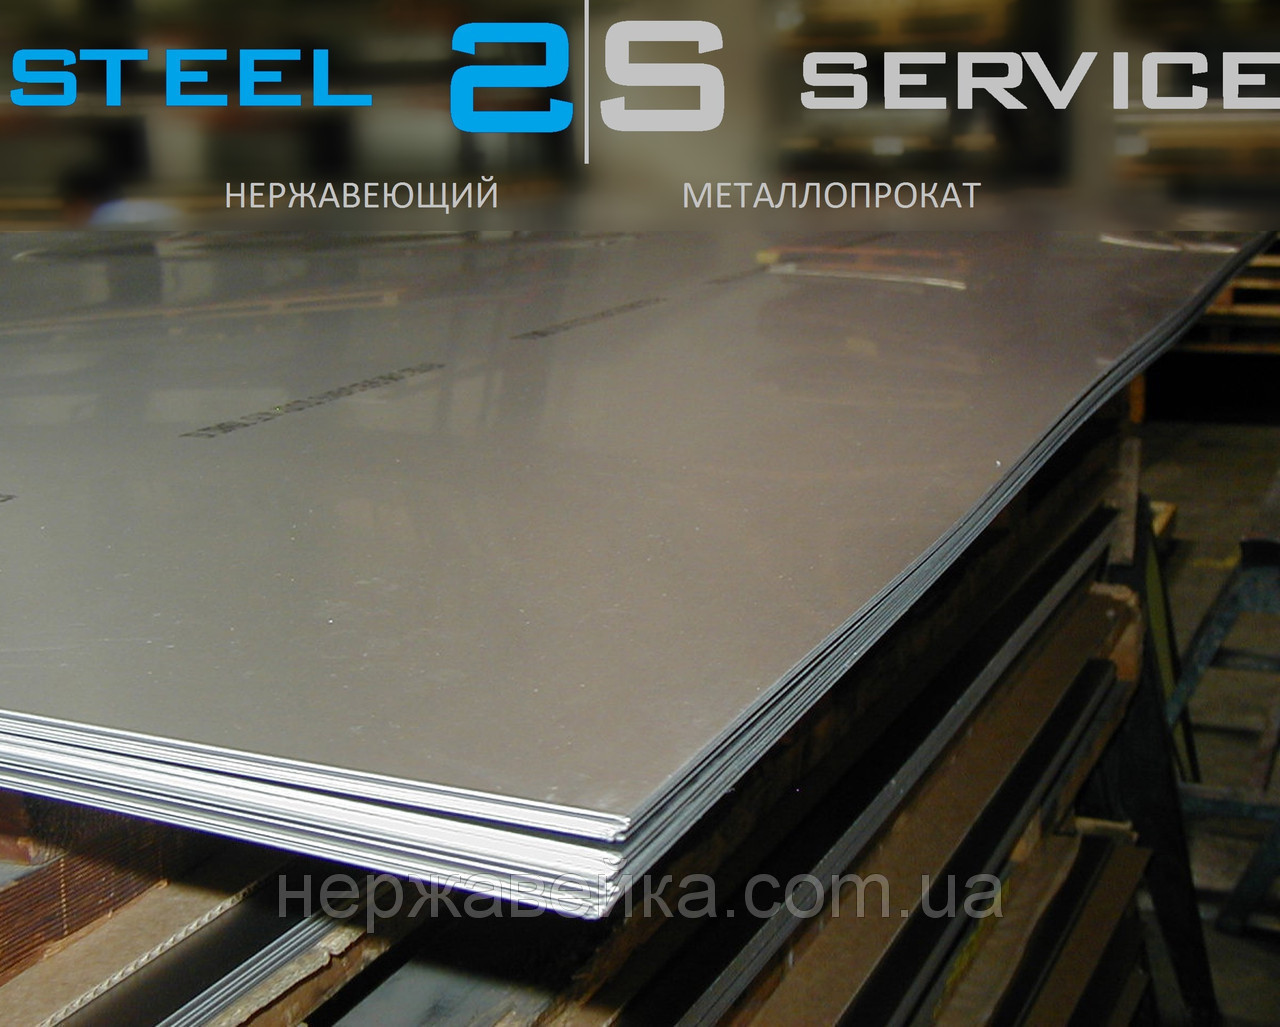 Нержавеющий лист 3х1500х3000мм AISI 430(12Х17) 2B - матовый, технический